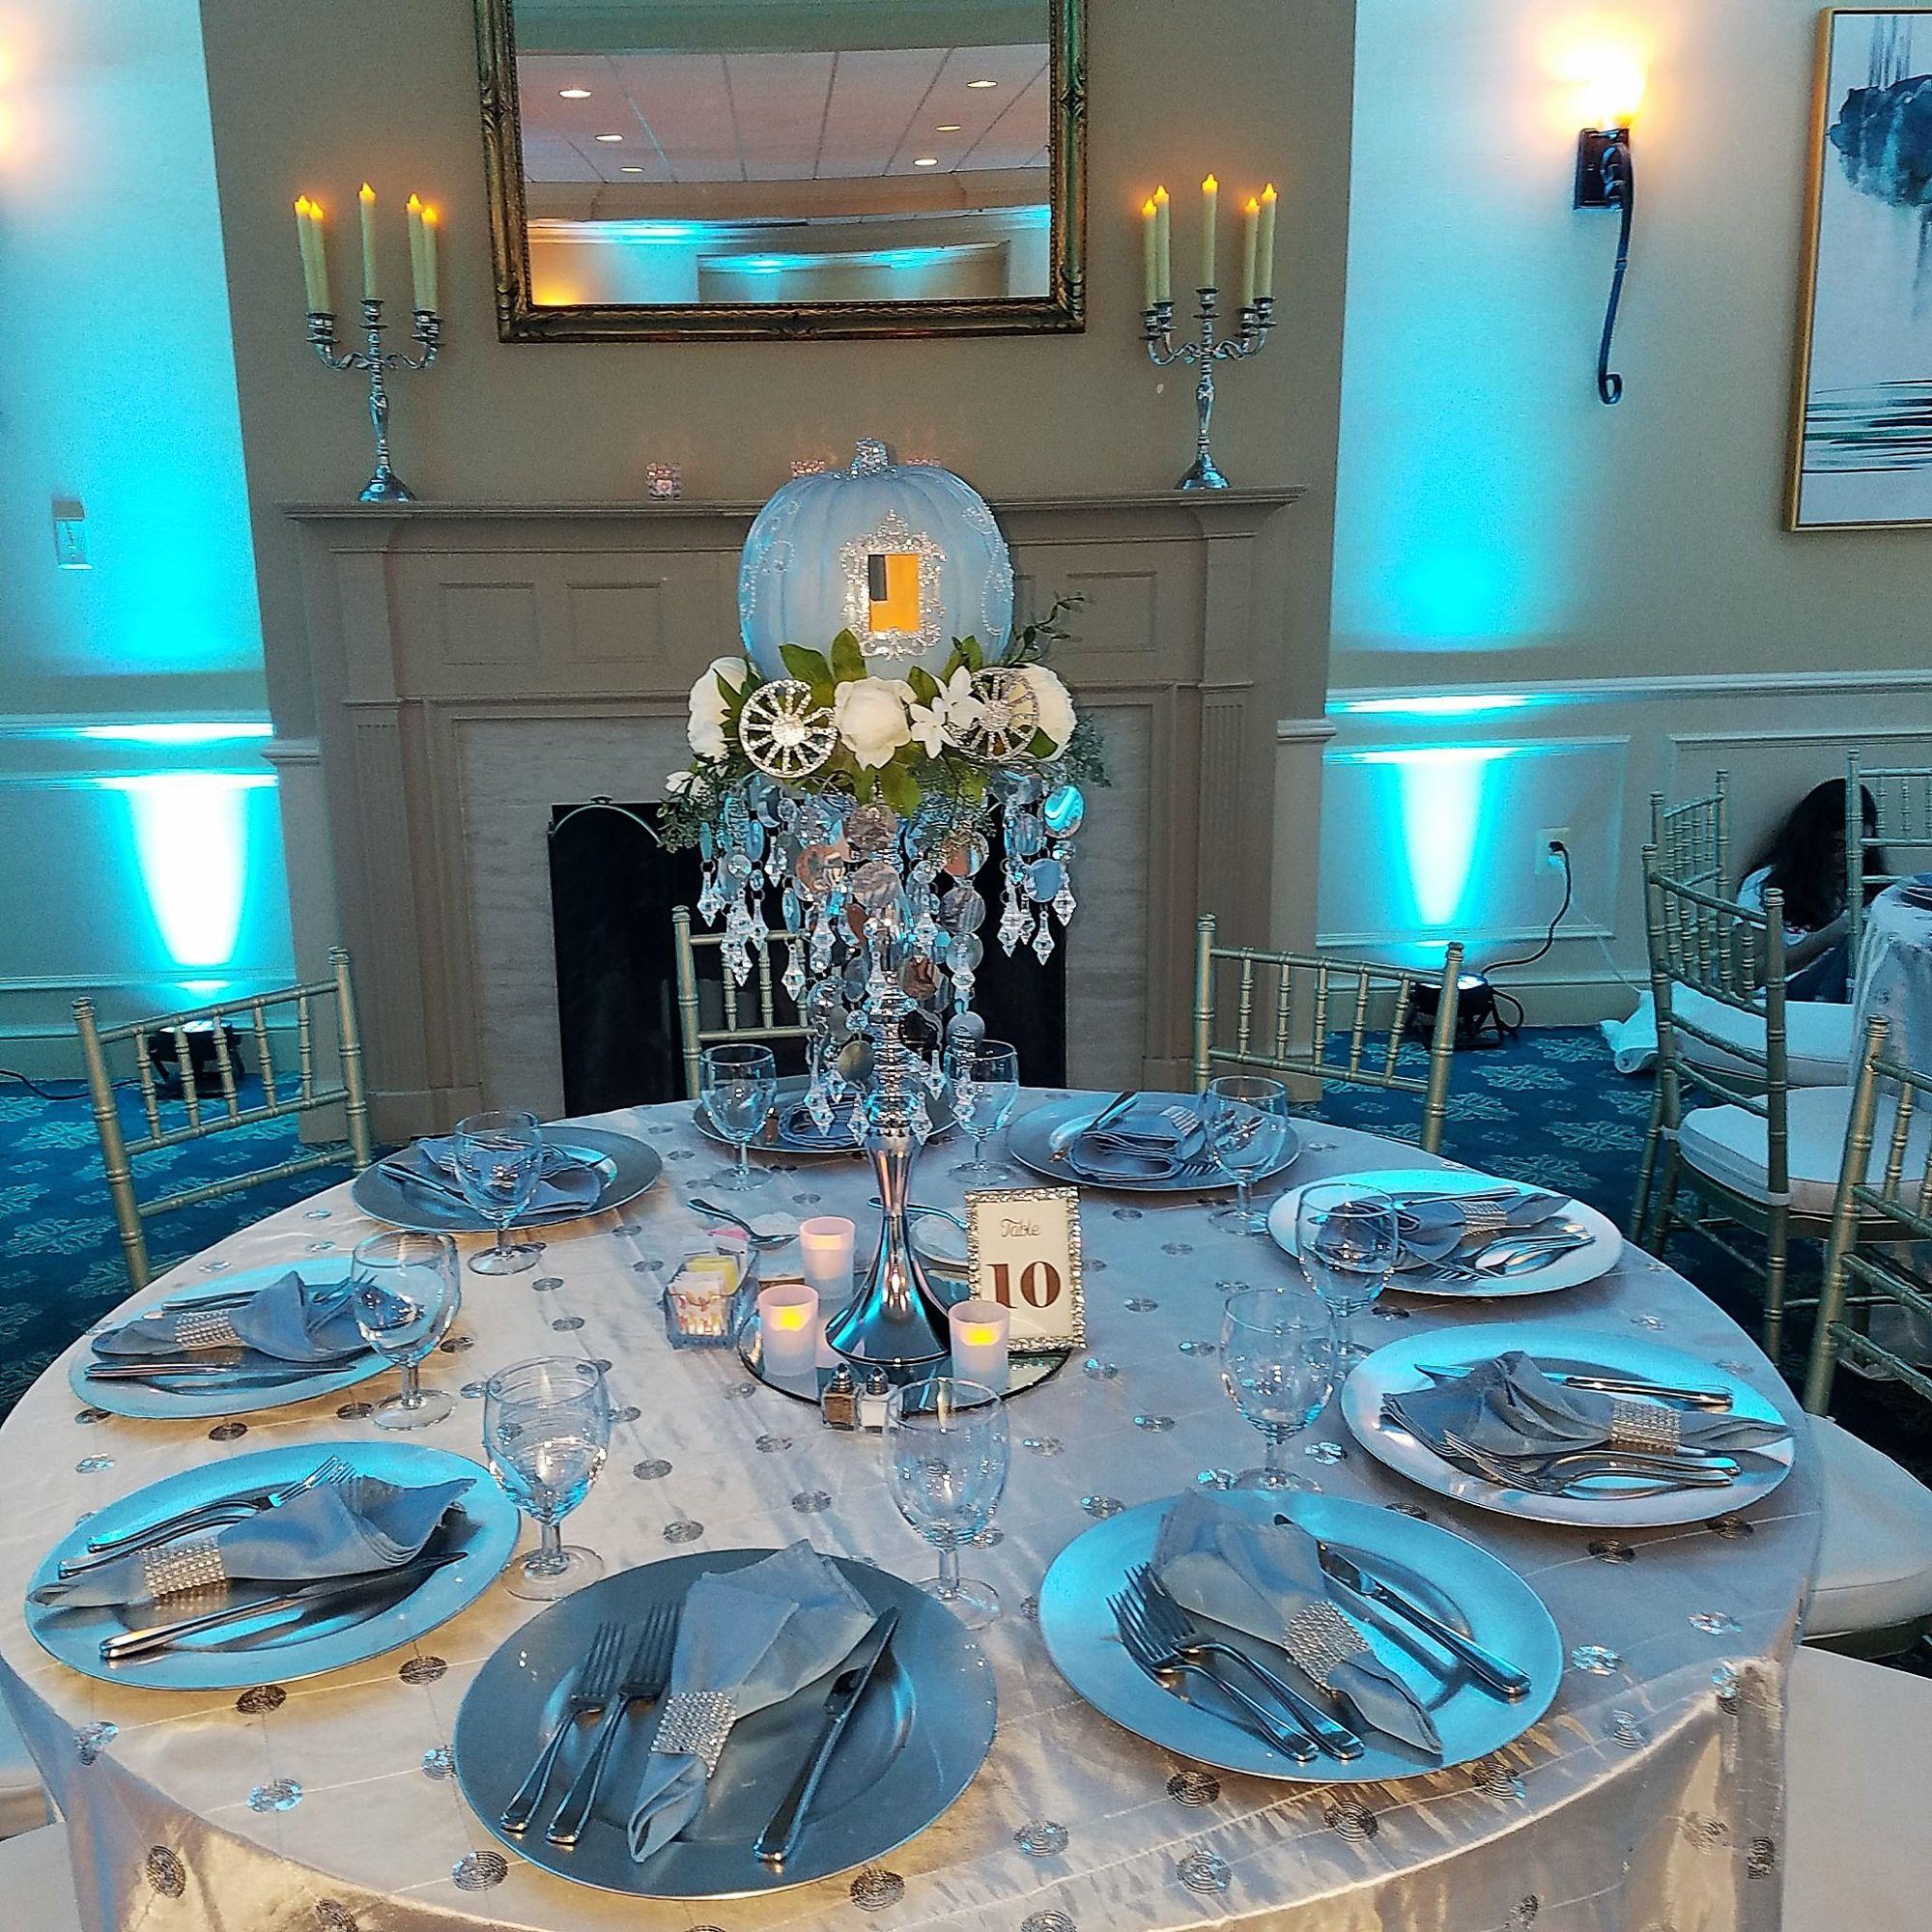 Cinderella Wedding Theme Ideas: Centerpiece For Quinceañera With Cinderella Theme